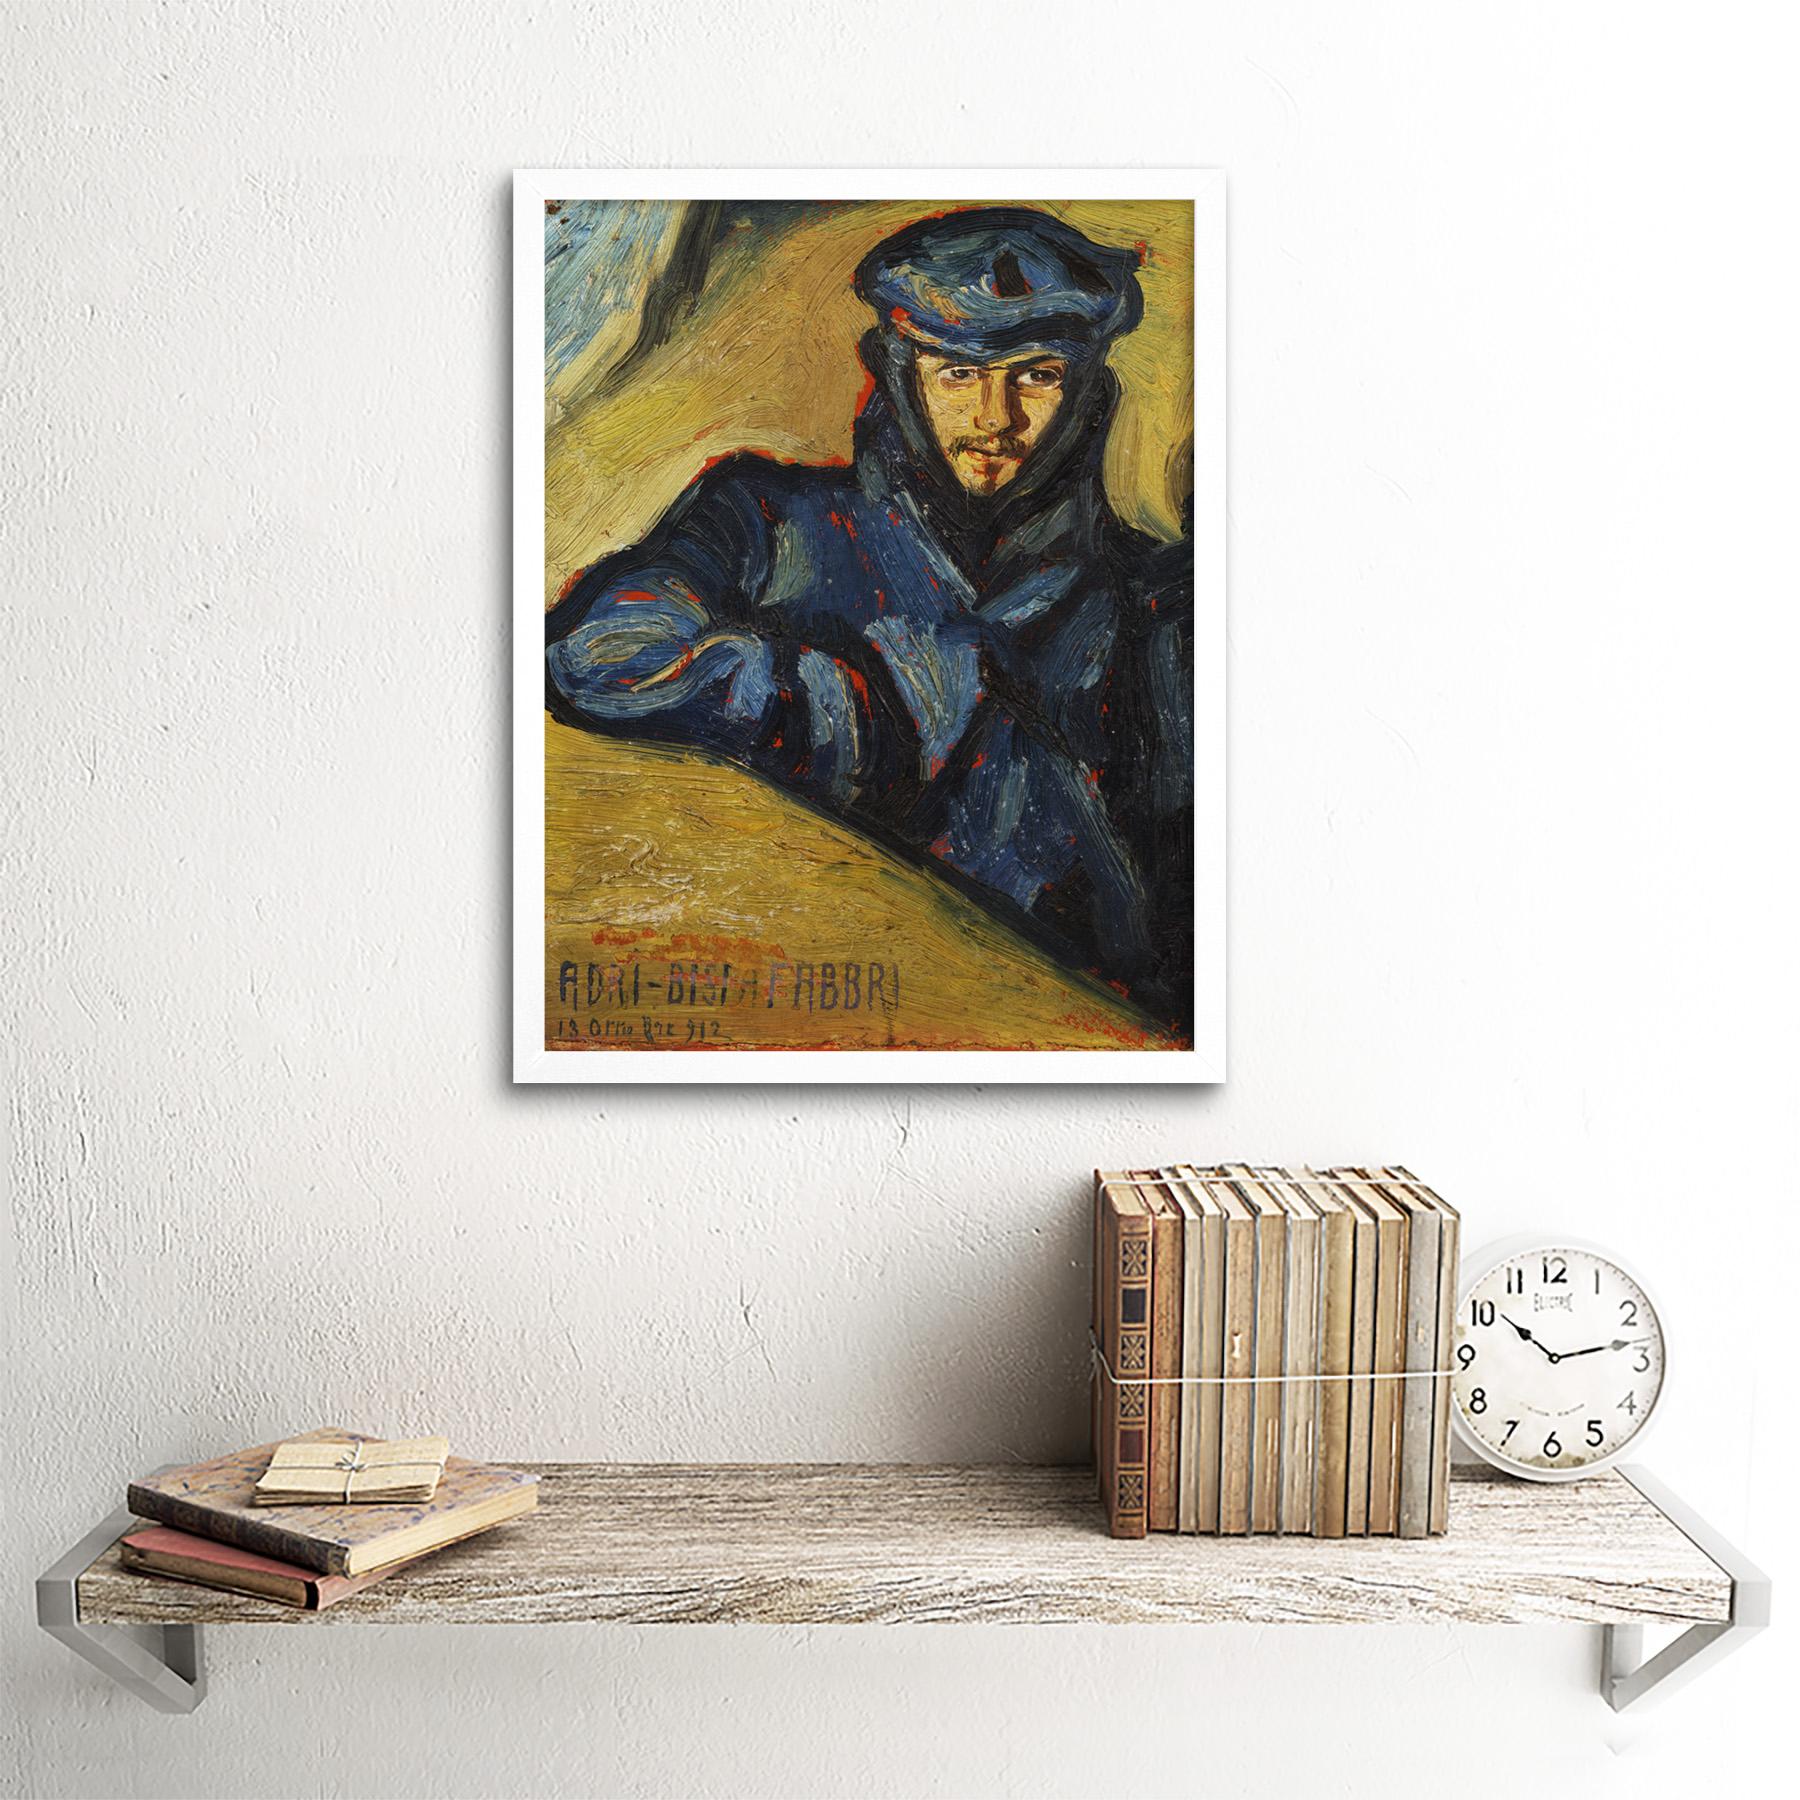 Bisi-Fabbri-Aviator-Pilot-Ricordo-Chavez-Painting-Framed-Wall-Art-Poster thumbnail 18